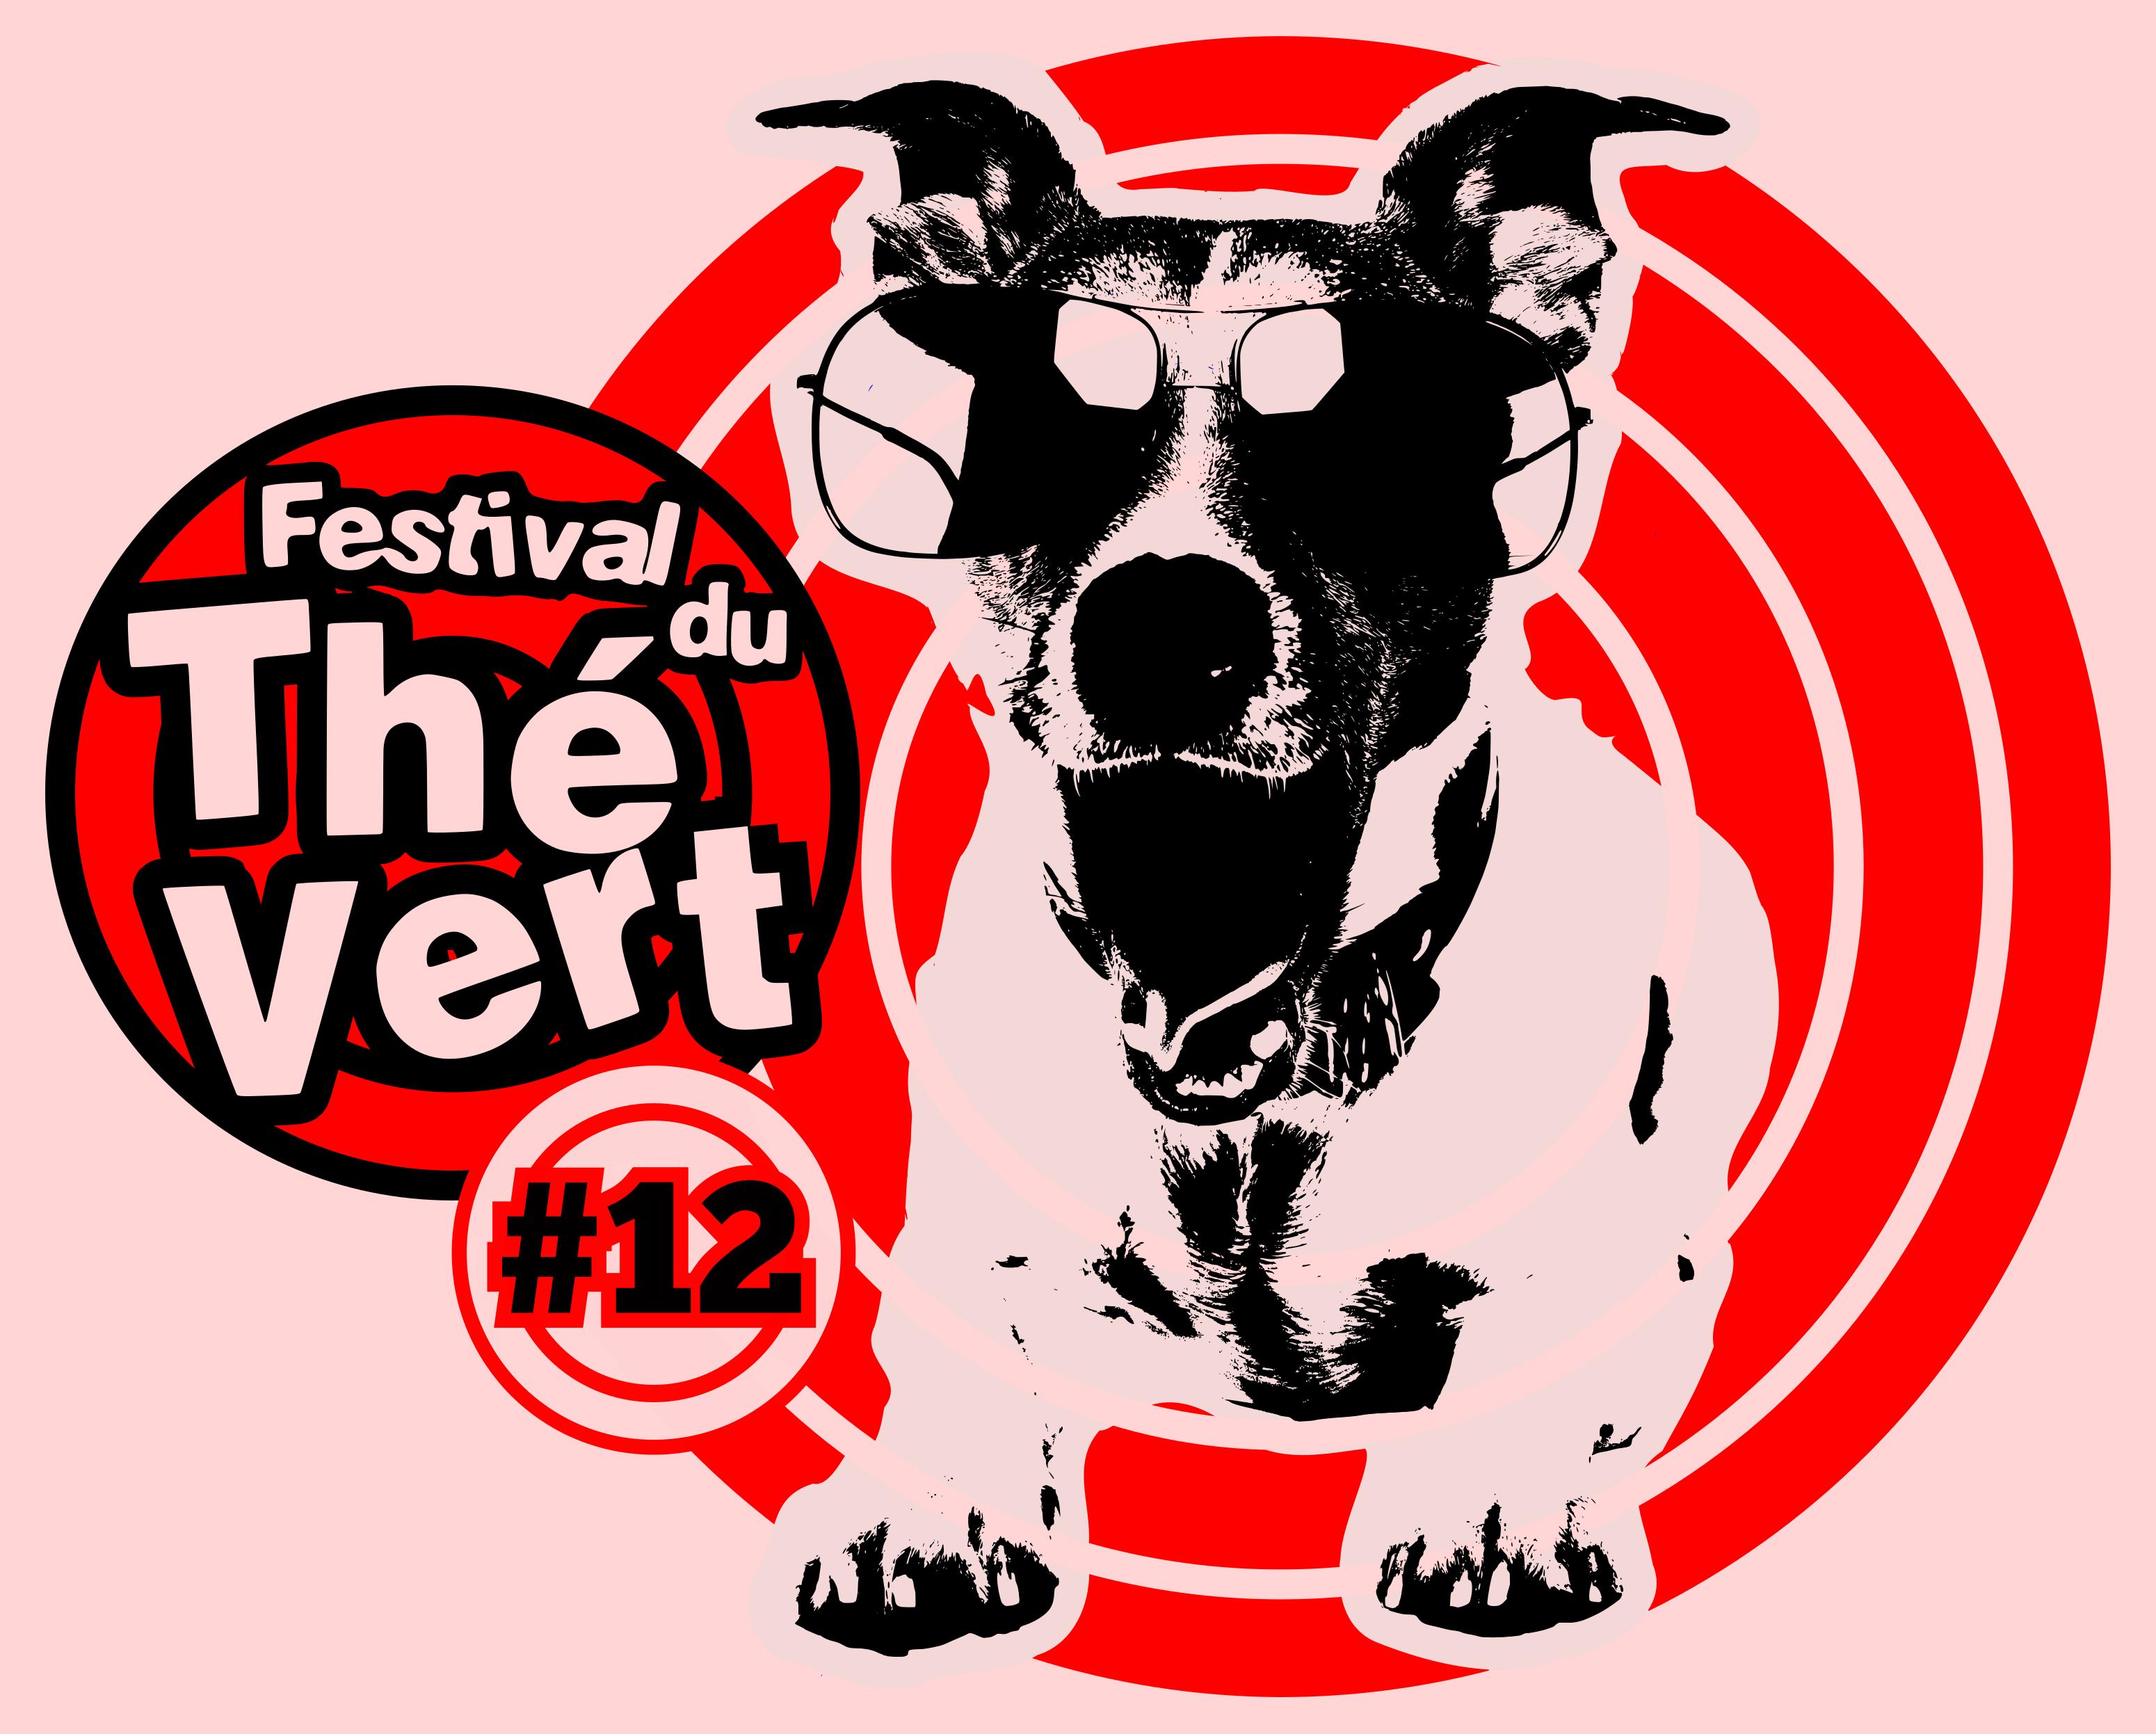 Festival du Thé Vert 2016 - Front T-Shirt